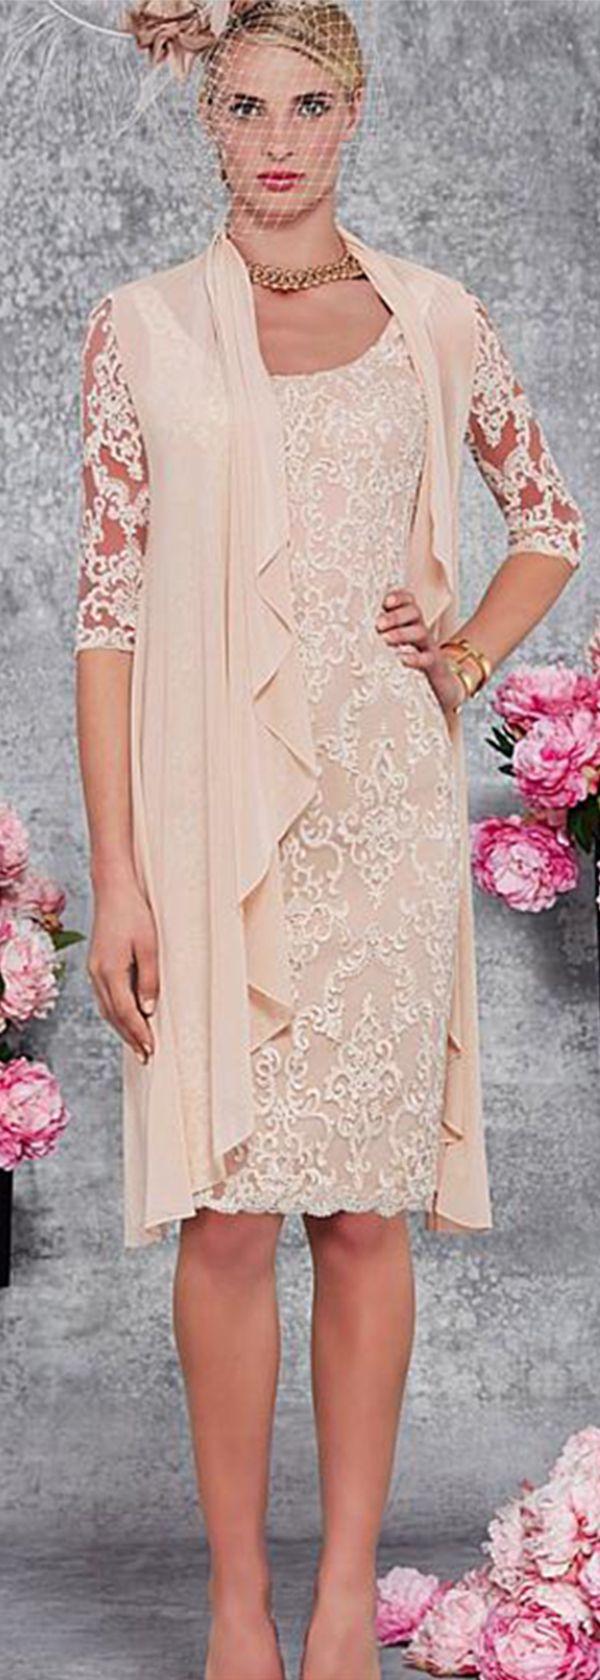 Romantic Lace & Chiffon Scoop Neckline Knee-length Sheath Mother Of The Bride Dress With Detachable Coat